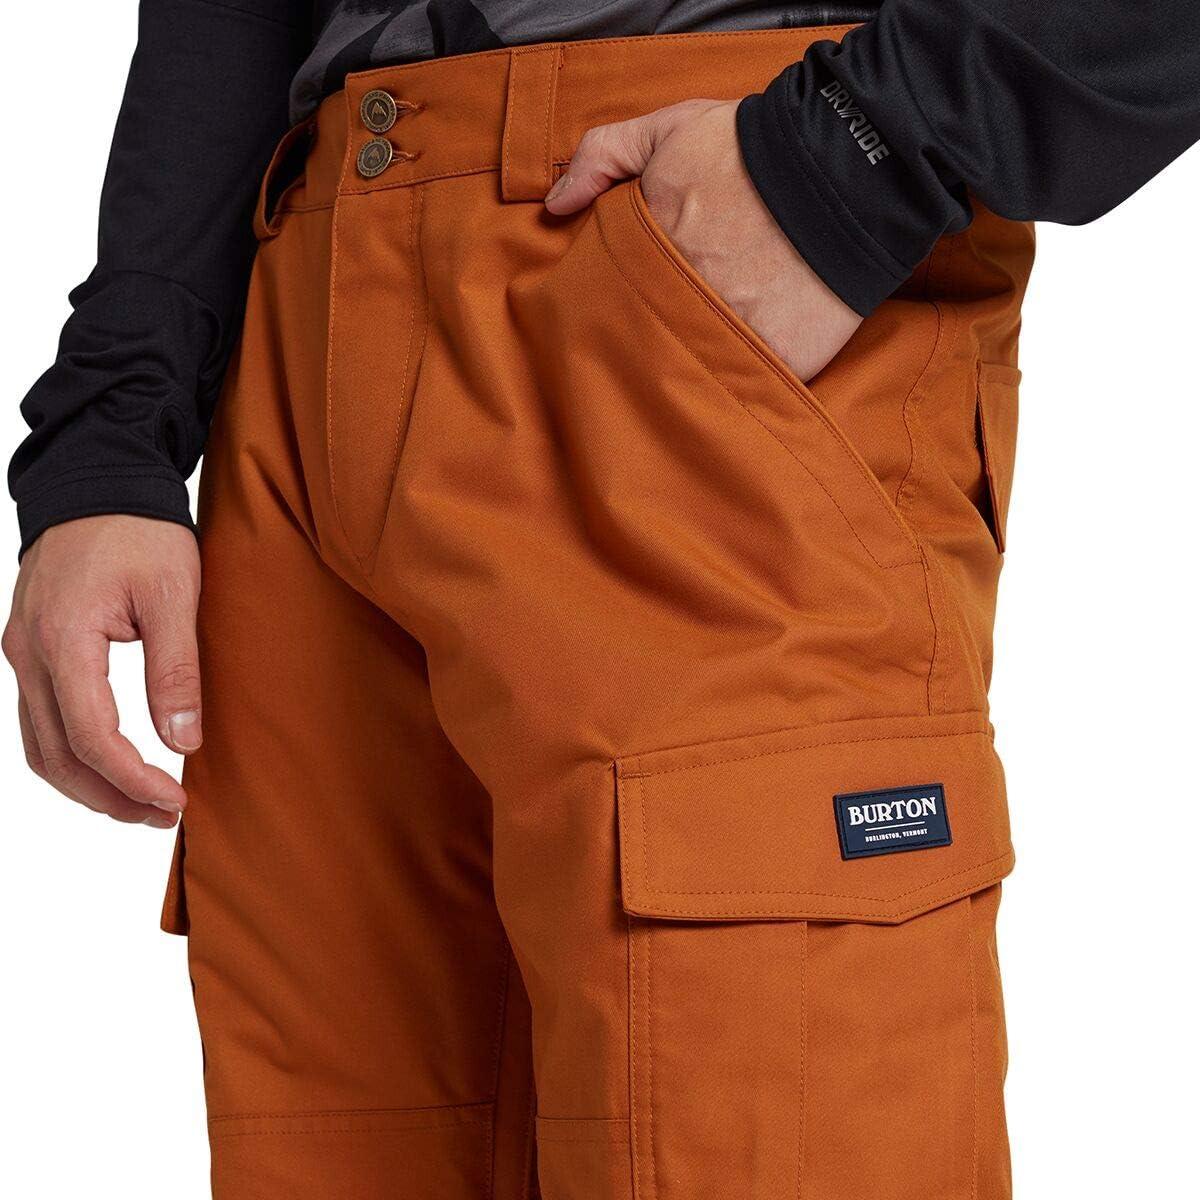 Burton Mens Cargo Pant Regular Fit